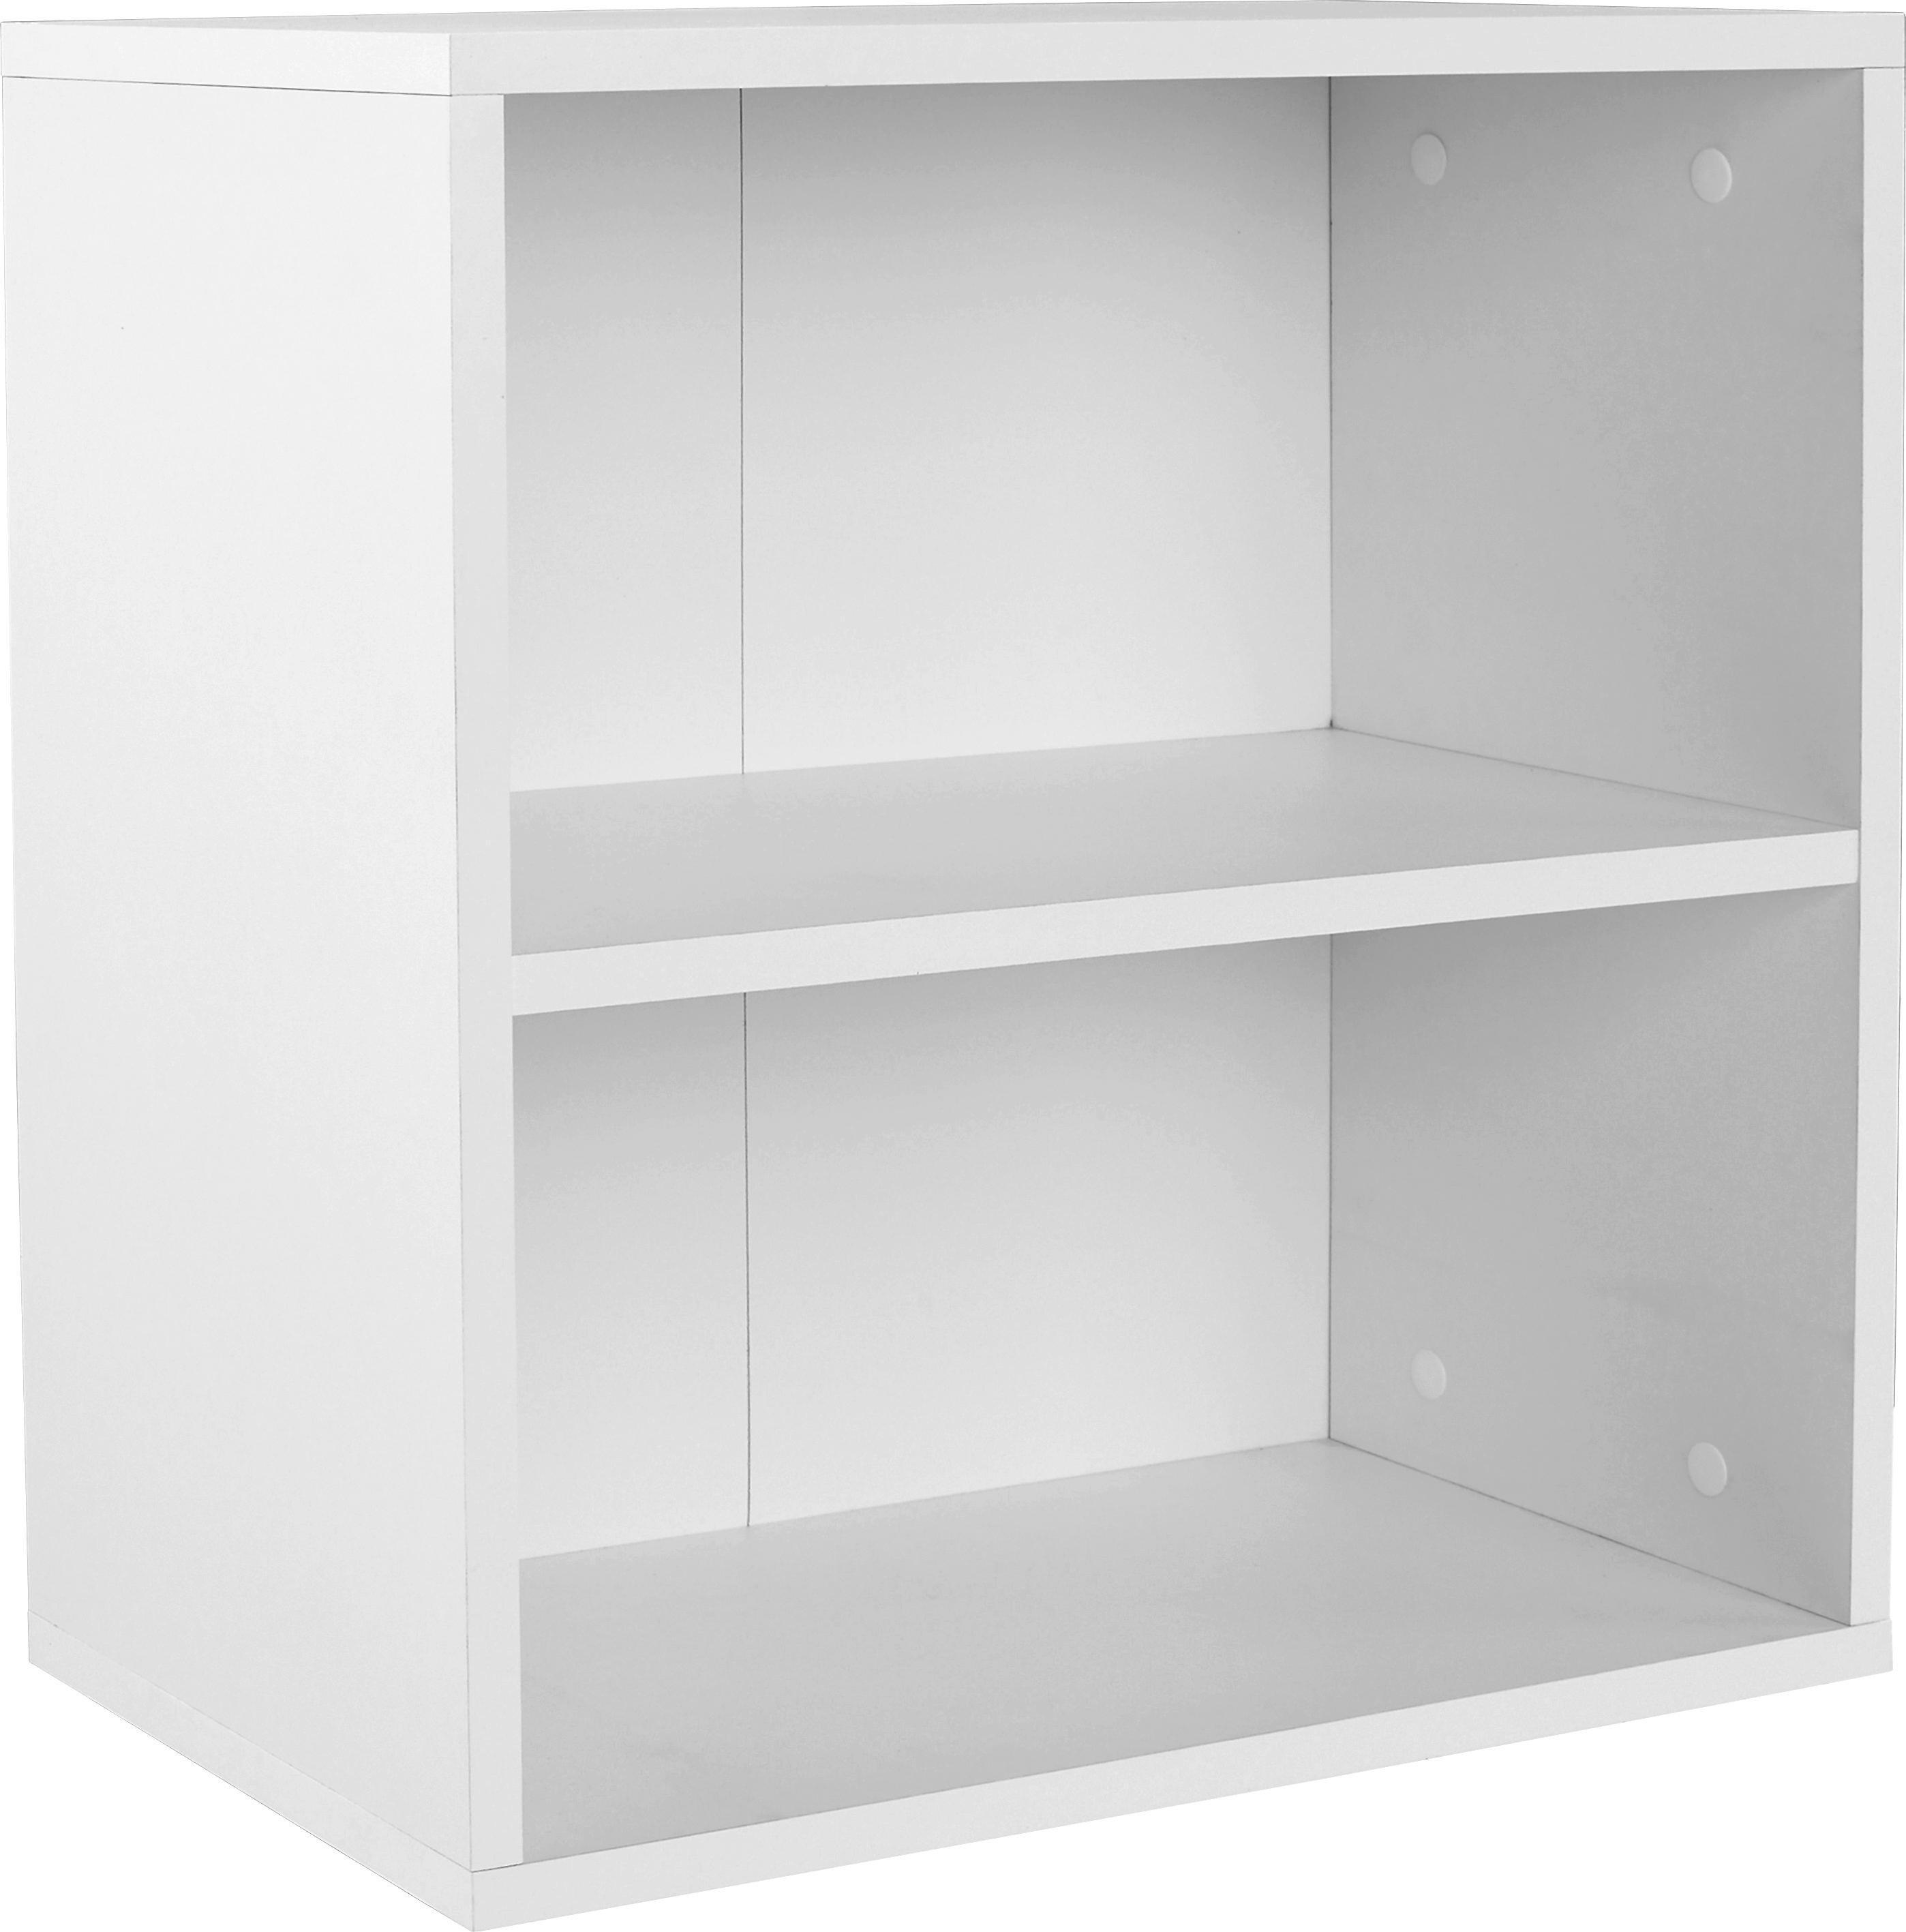 Wandregal Weiß 36 x 54 cm | Wandregal, Wandregal weiß, Regal